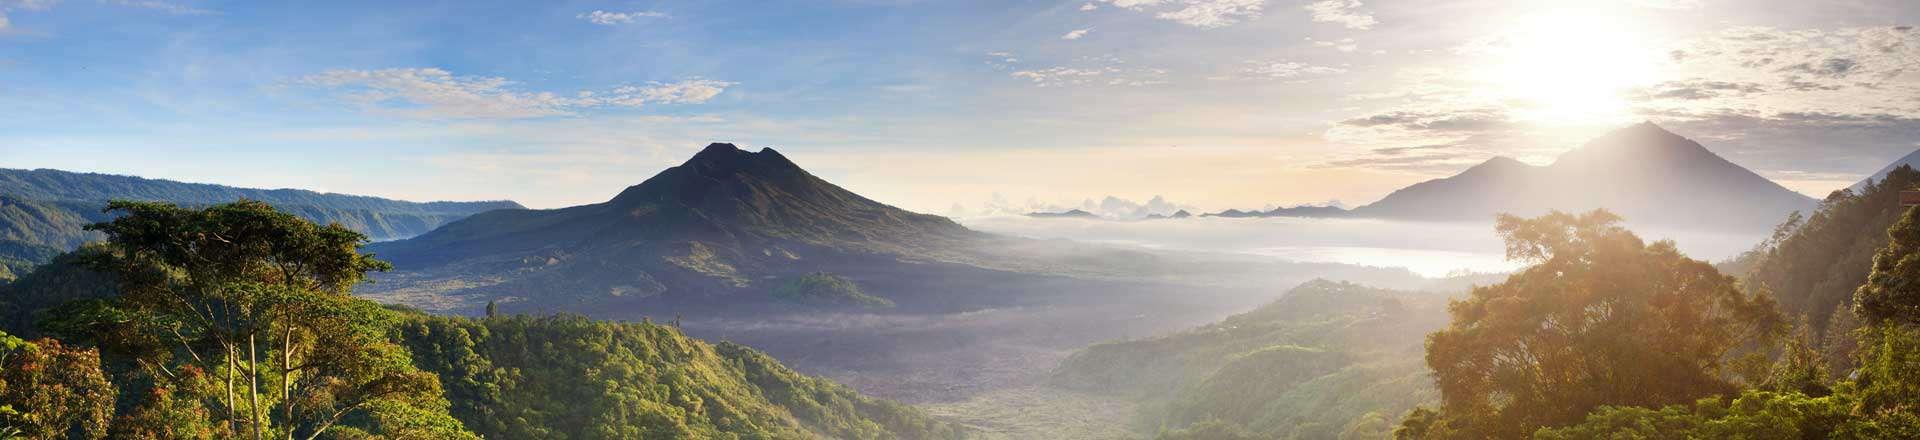 Mont Batur Bali Volcan Caldeira Indonésie